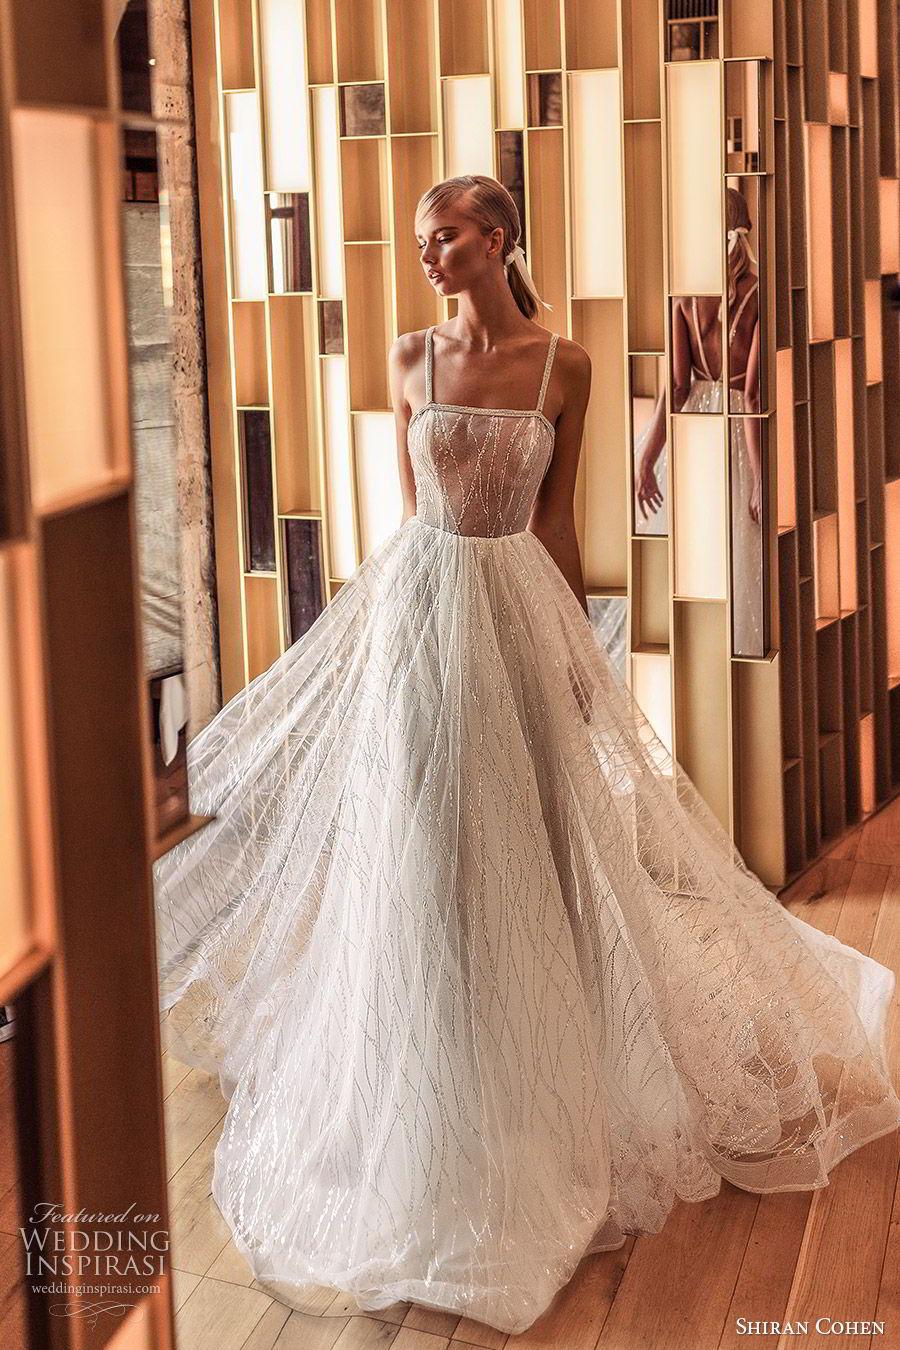 shiran cohen 2019 bridal sleeveless beaded straps fully embellished a line ball gown wedding dress glitzy romantic princess (8) mv